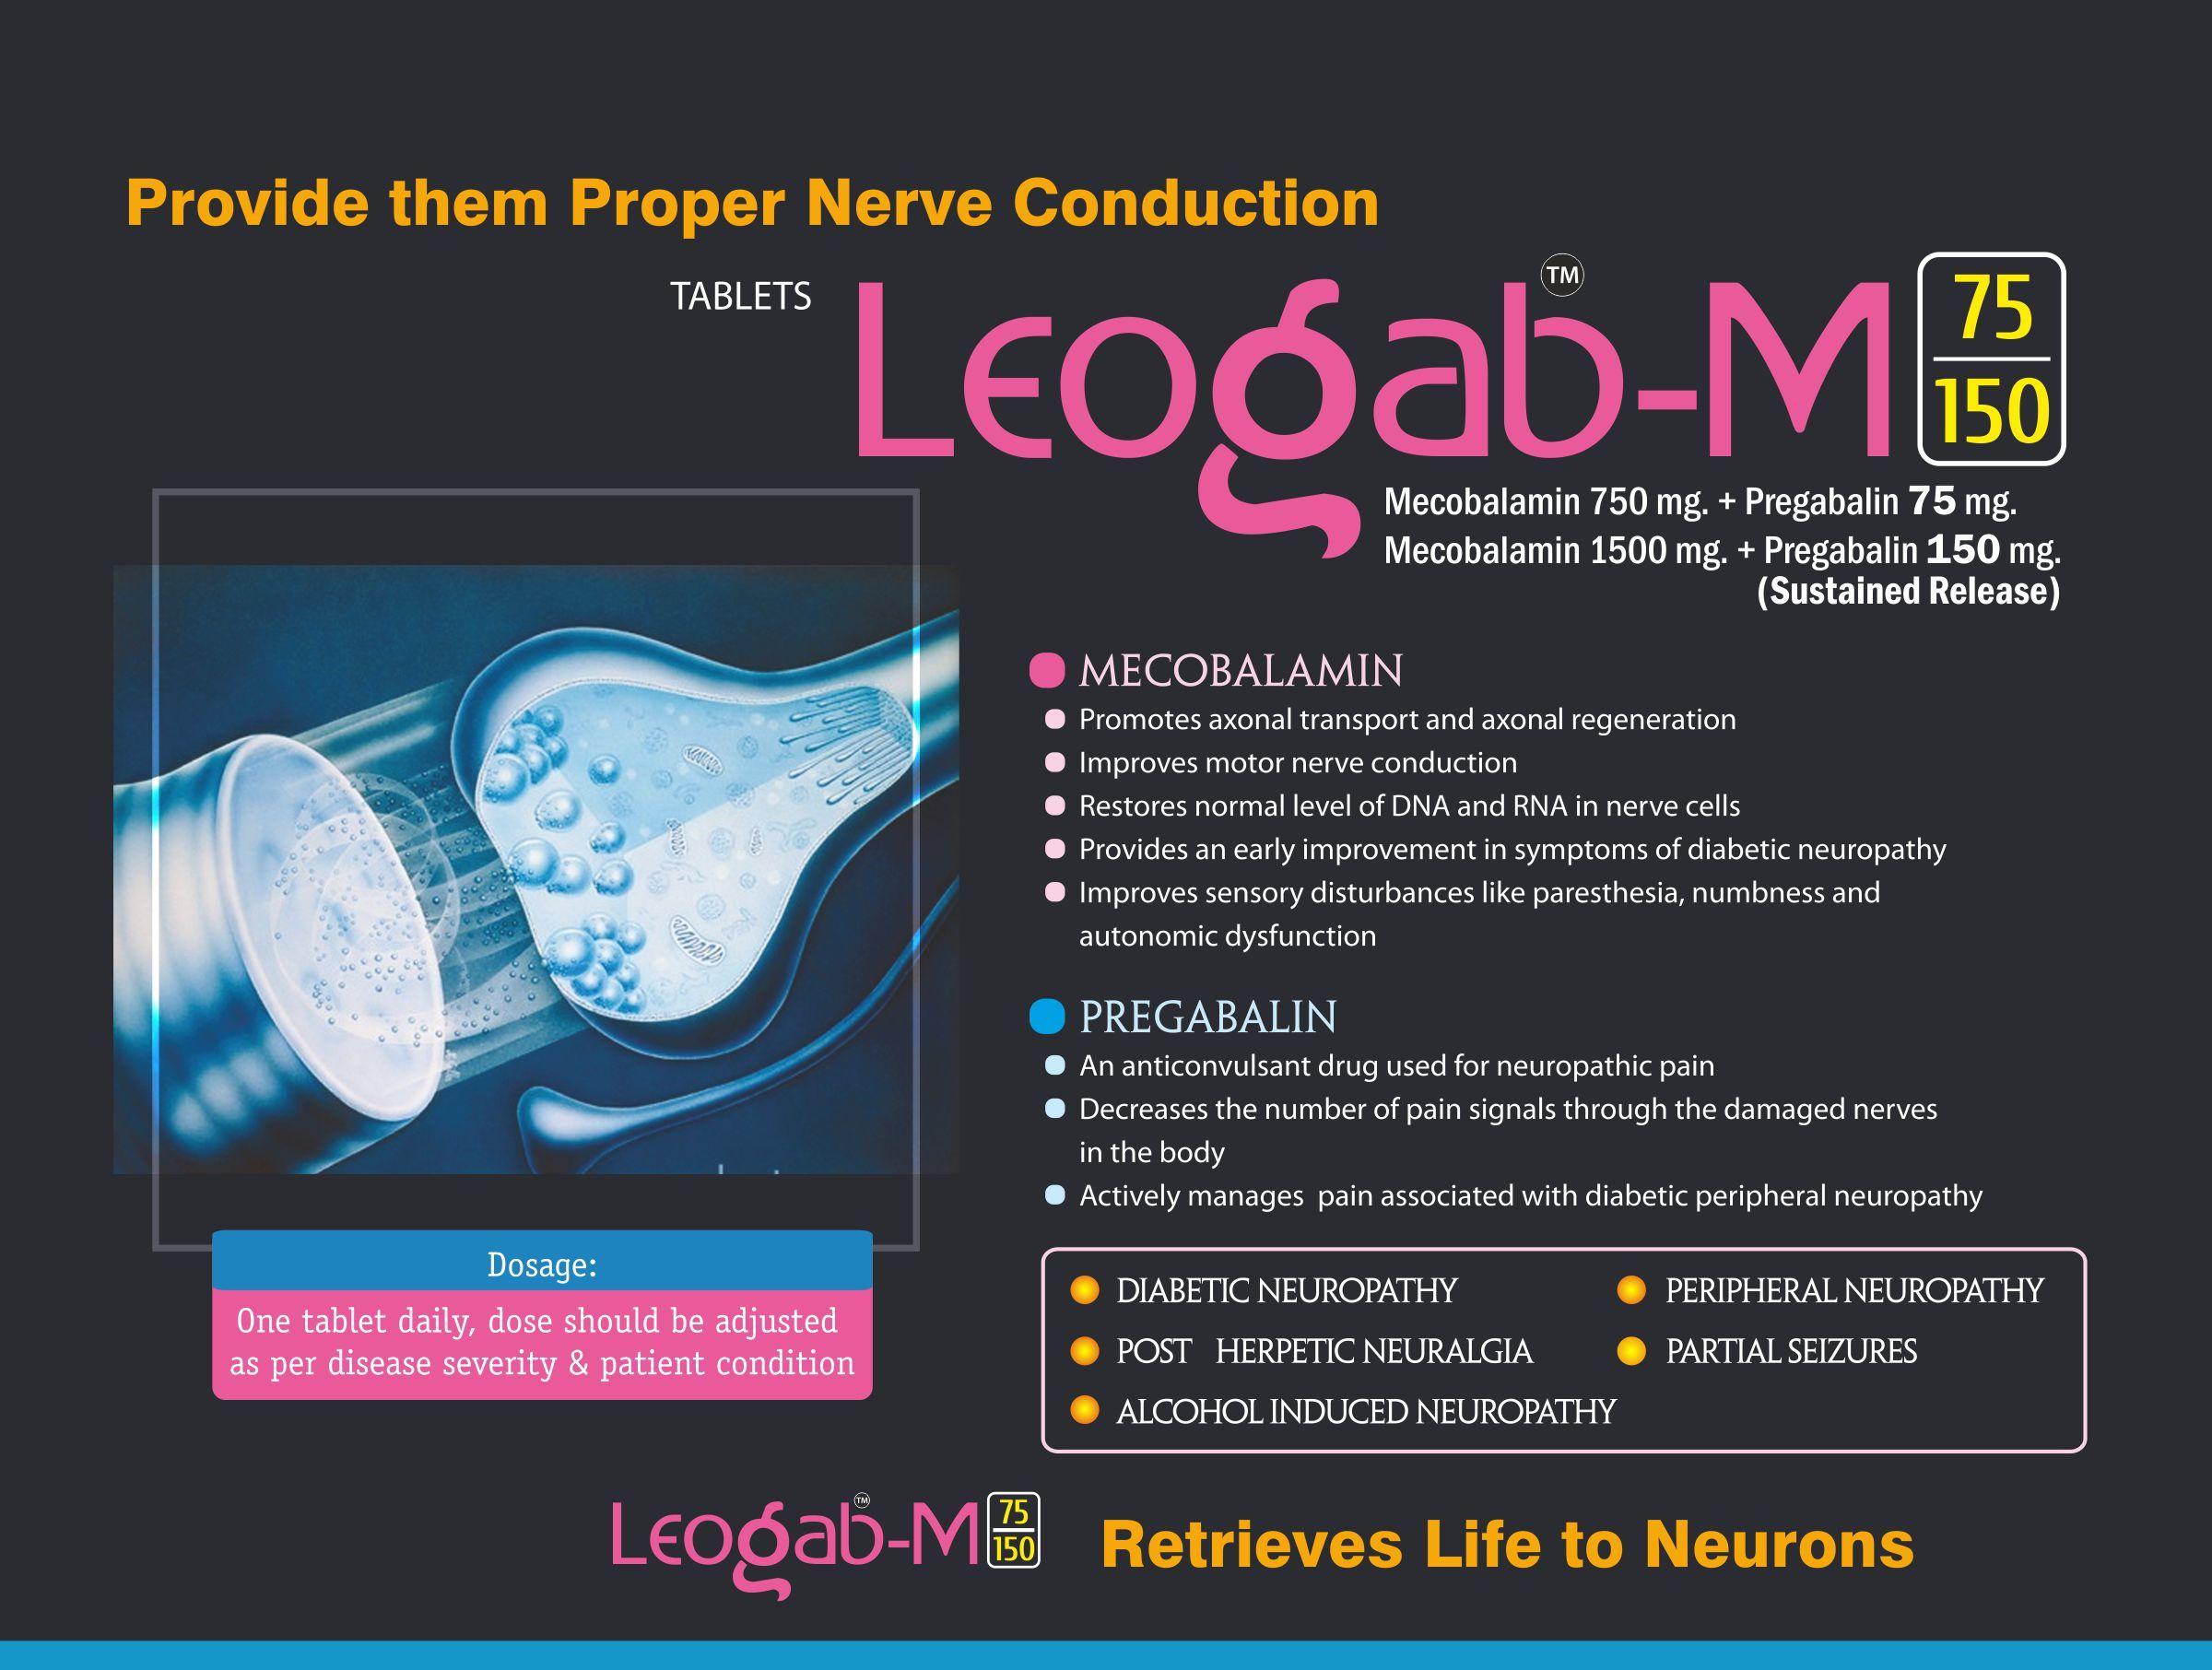 Mecobalamin & Pregabalin Tablet